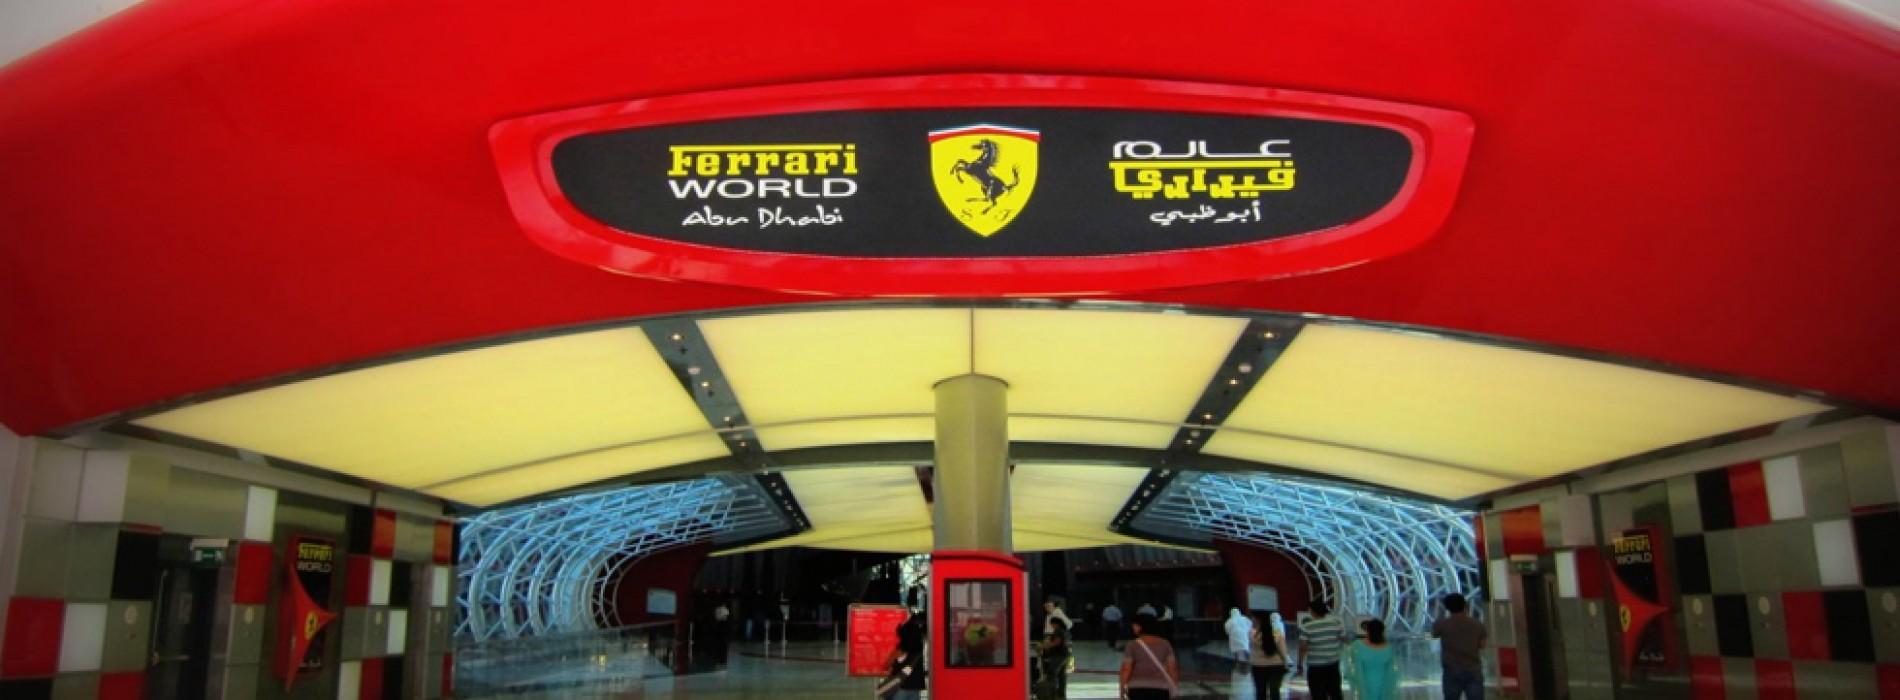 Drive around Yas Island in a Ferrari